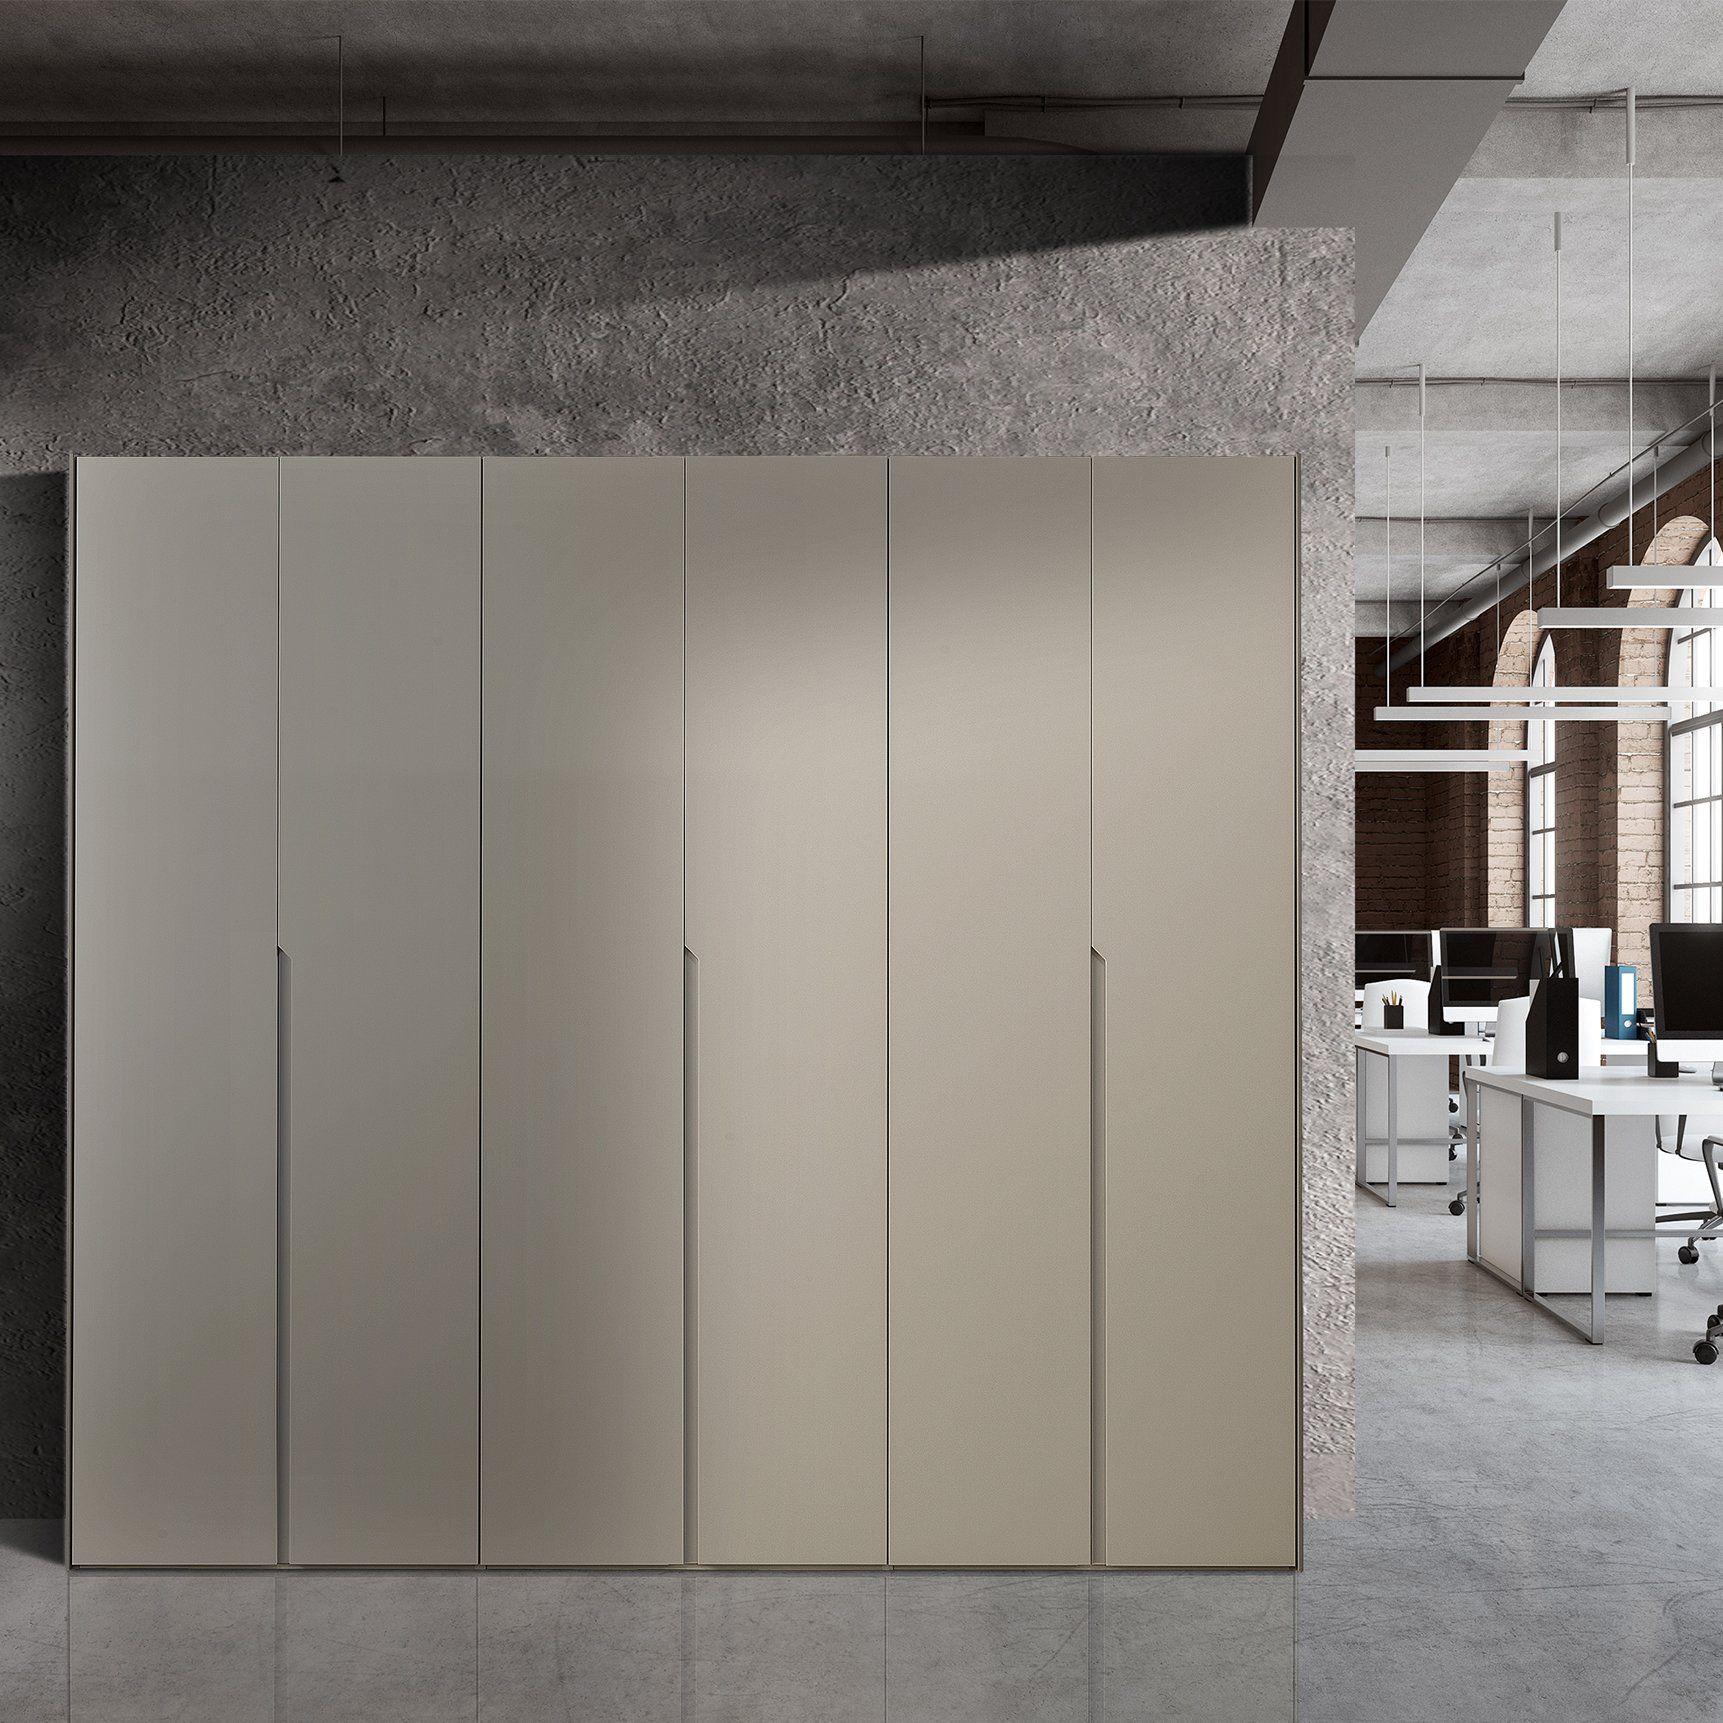 Buroschrank In 2020 Custom Sideboard Bars For Home Free Standing Wardrobe